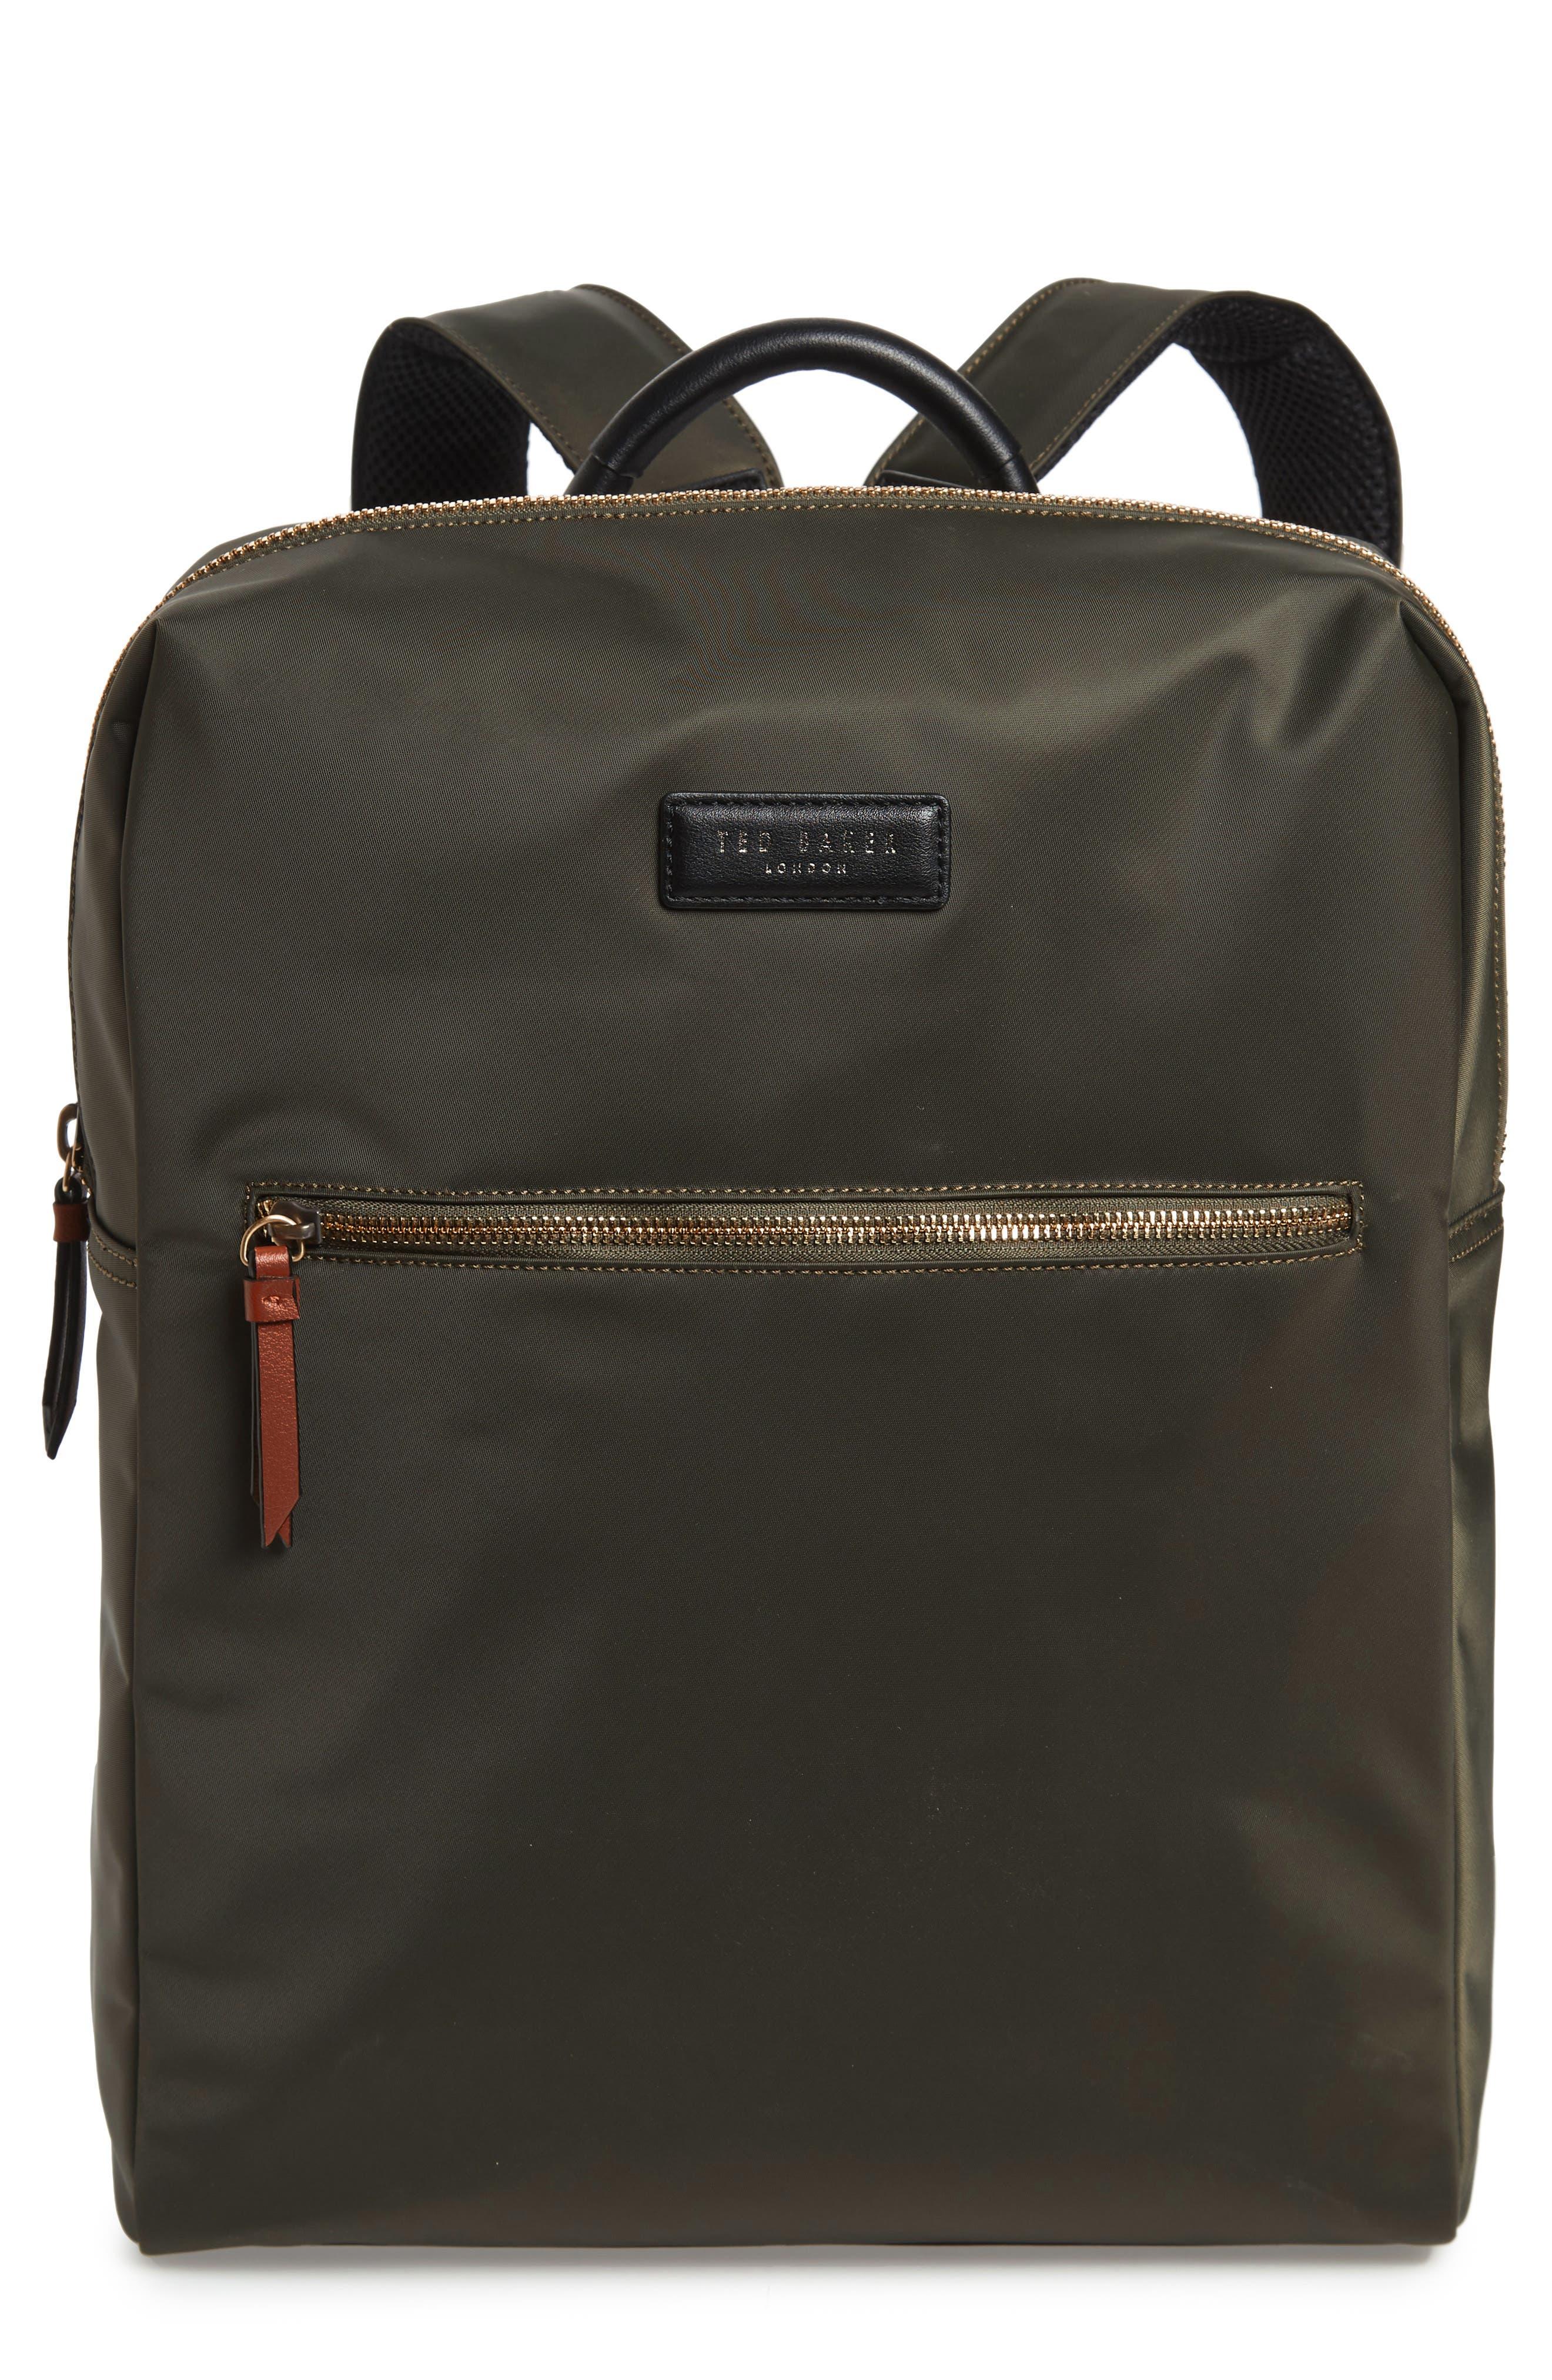 c81df20de90 Ted Baker London Canddle Backpack - Green